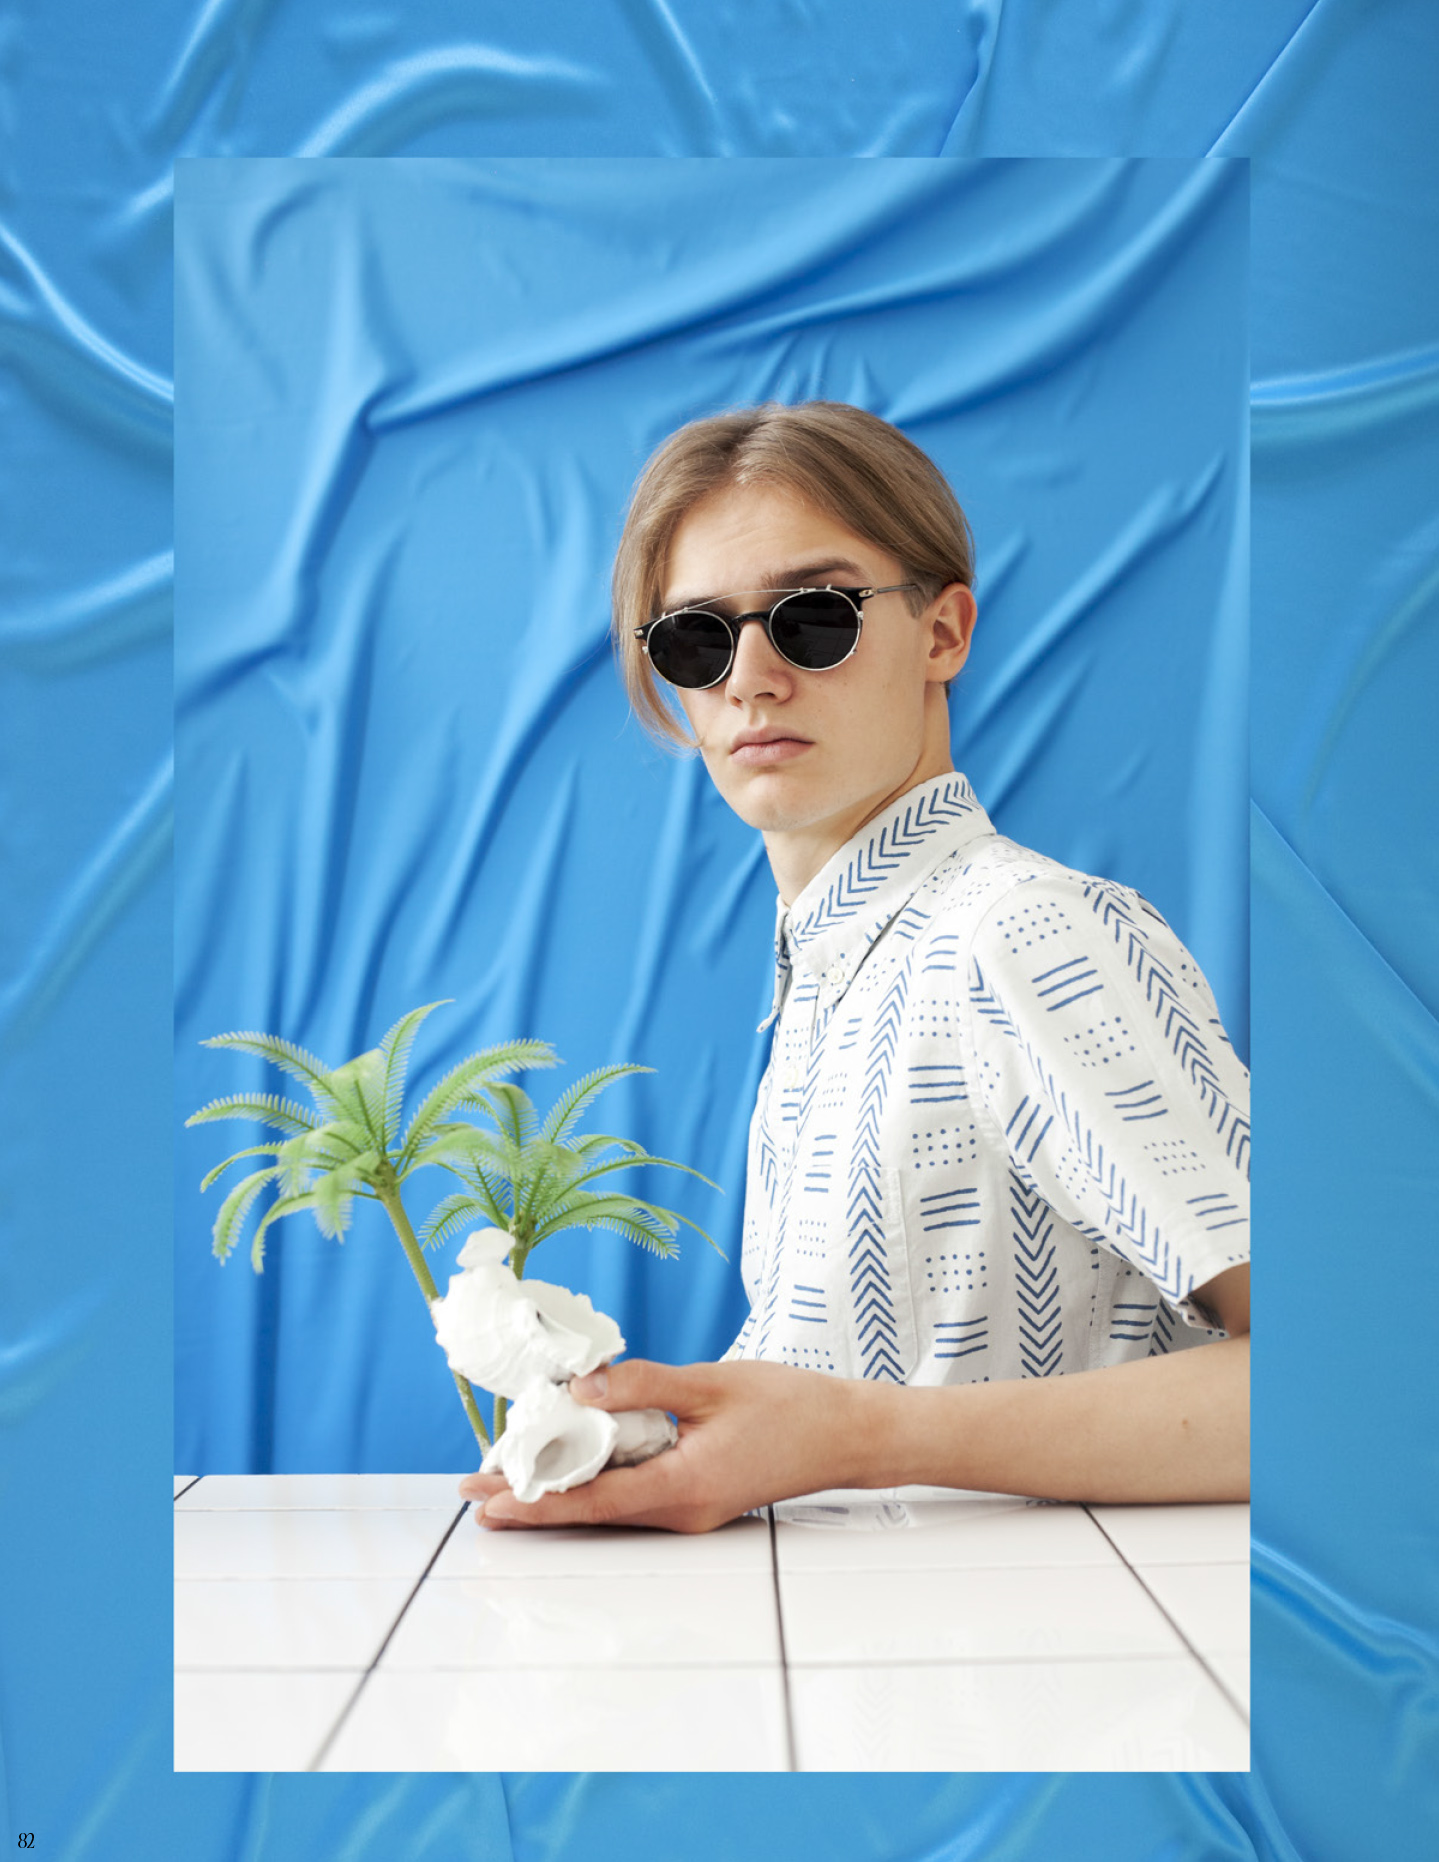 Photo from the portfolio of Lisann Lillevere (EAA Open Academy Fashion Stylistics 2016), stylistics/AD Lisann Lillevere, window display Lisann Lillevere/Kristina Õllek, photographer Kristina Õllek, supervisor Inessa Josing.